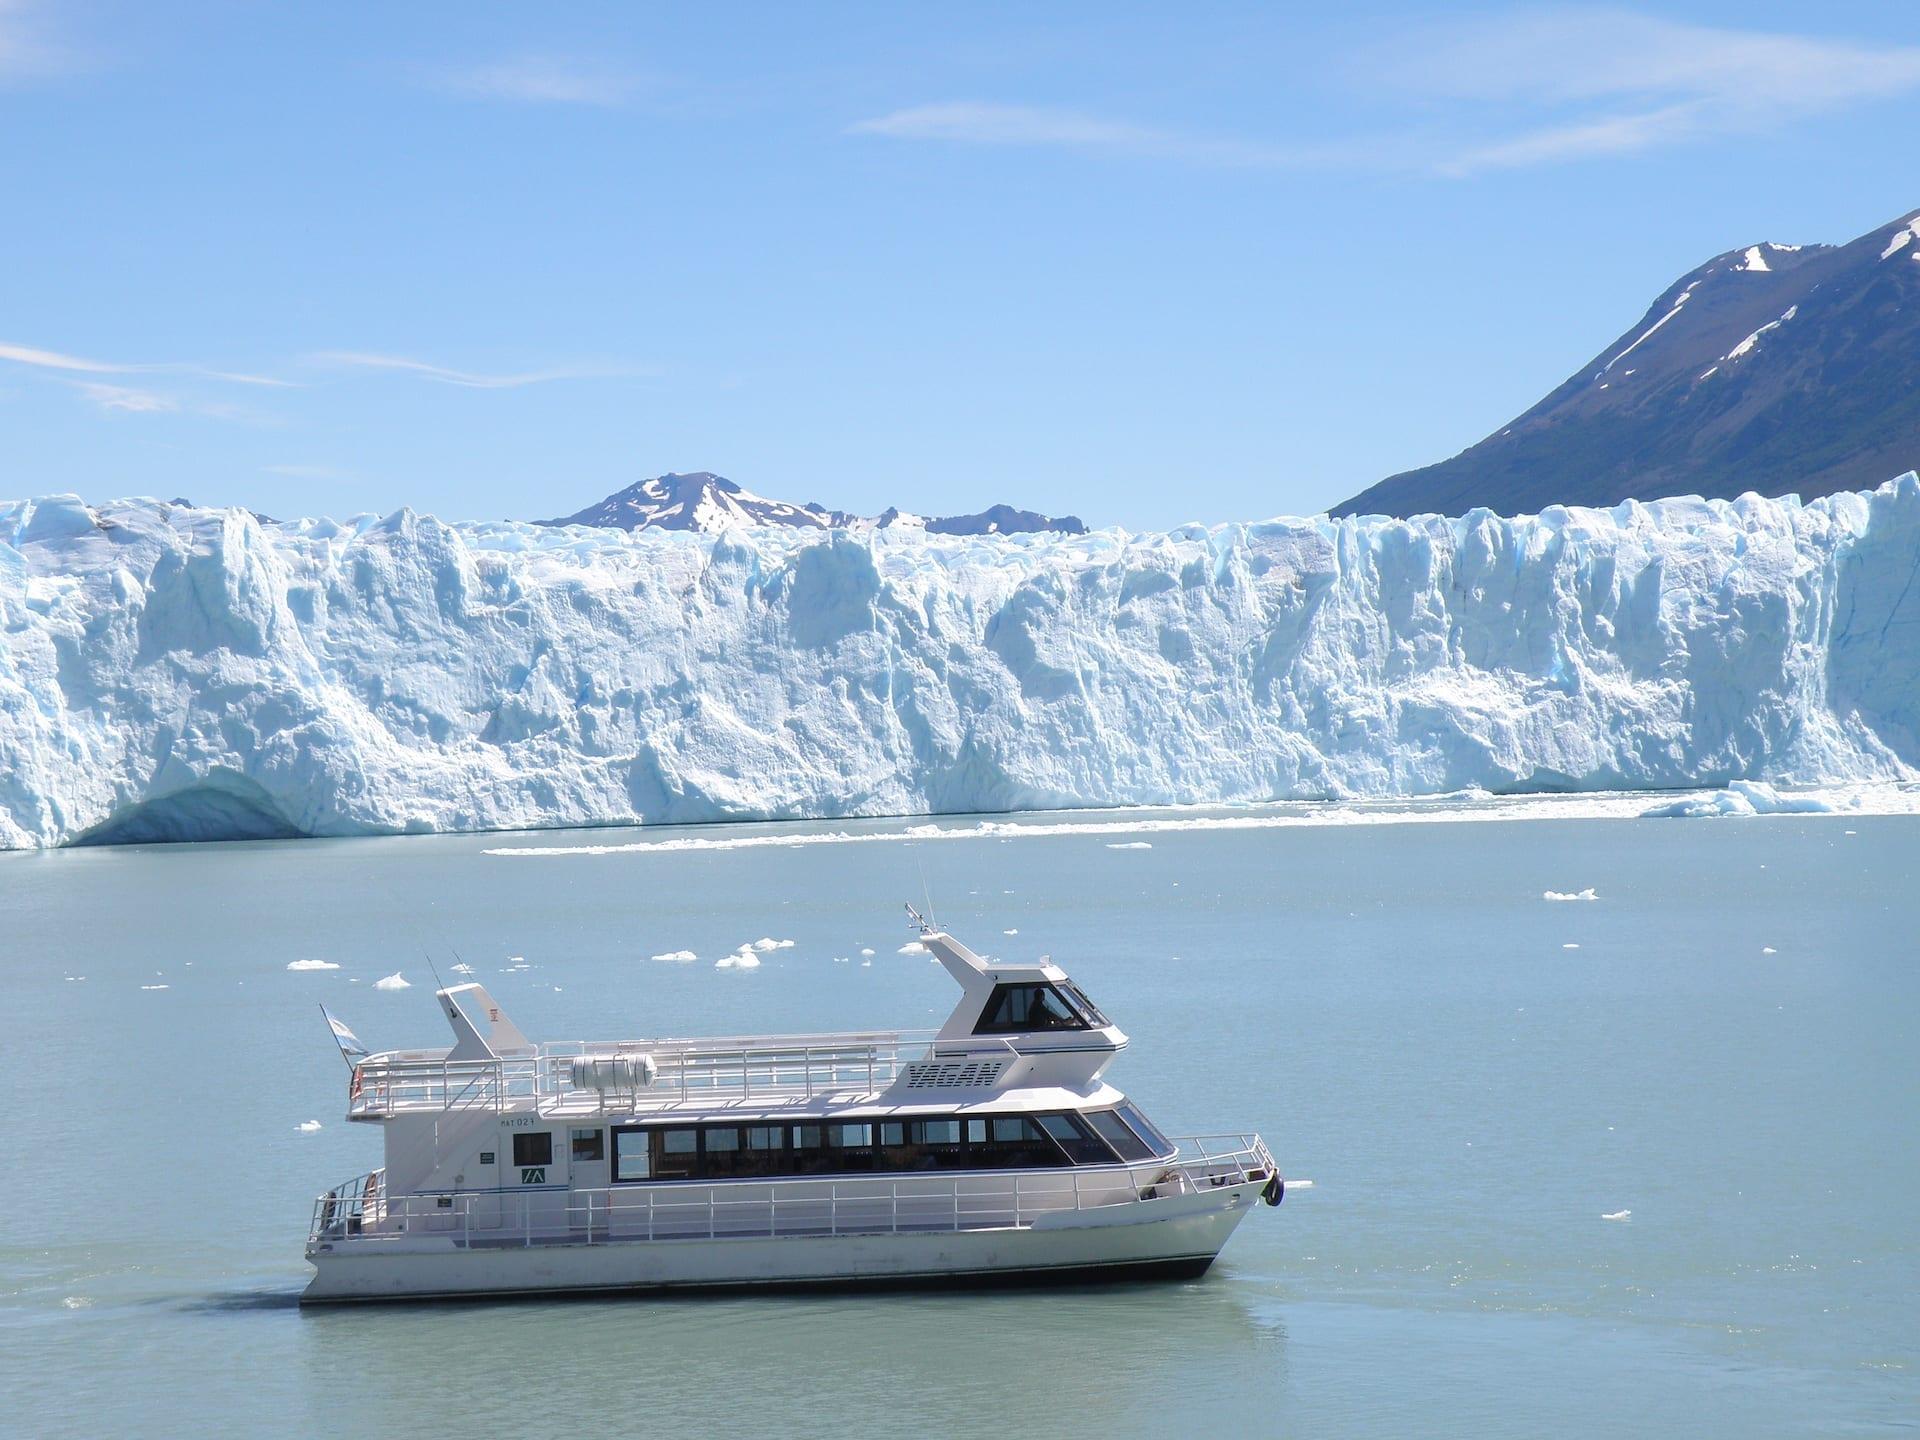 OVERIGE LANDEN - ALGEMEEN - Perito Moreno gletsjer, Argentinië